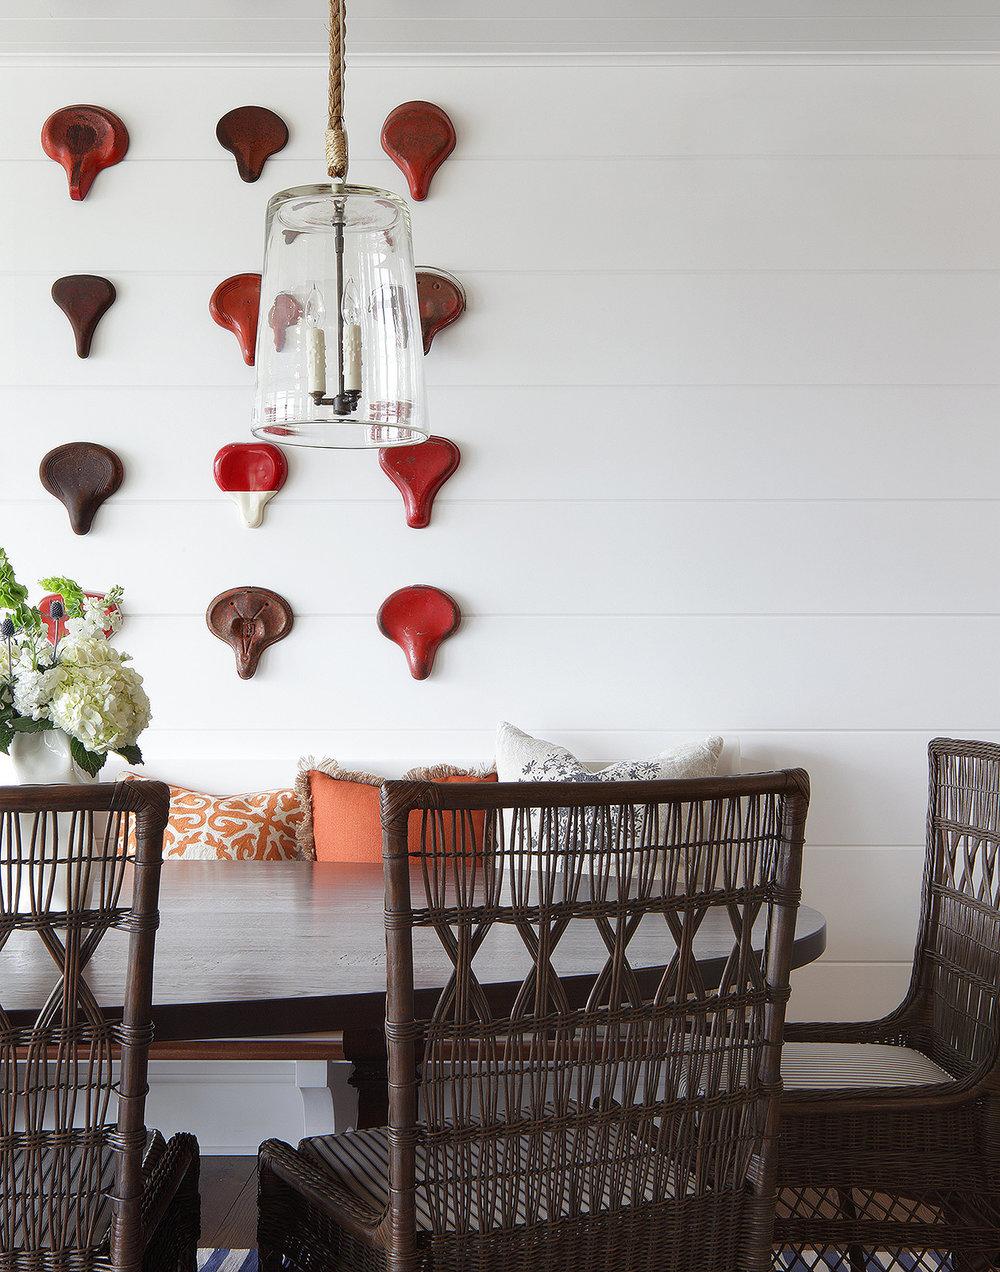 Architectural photography for Boston interior designers